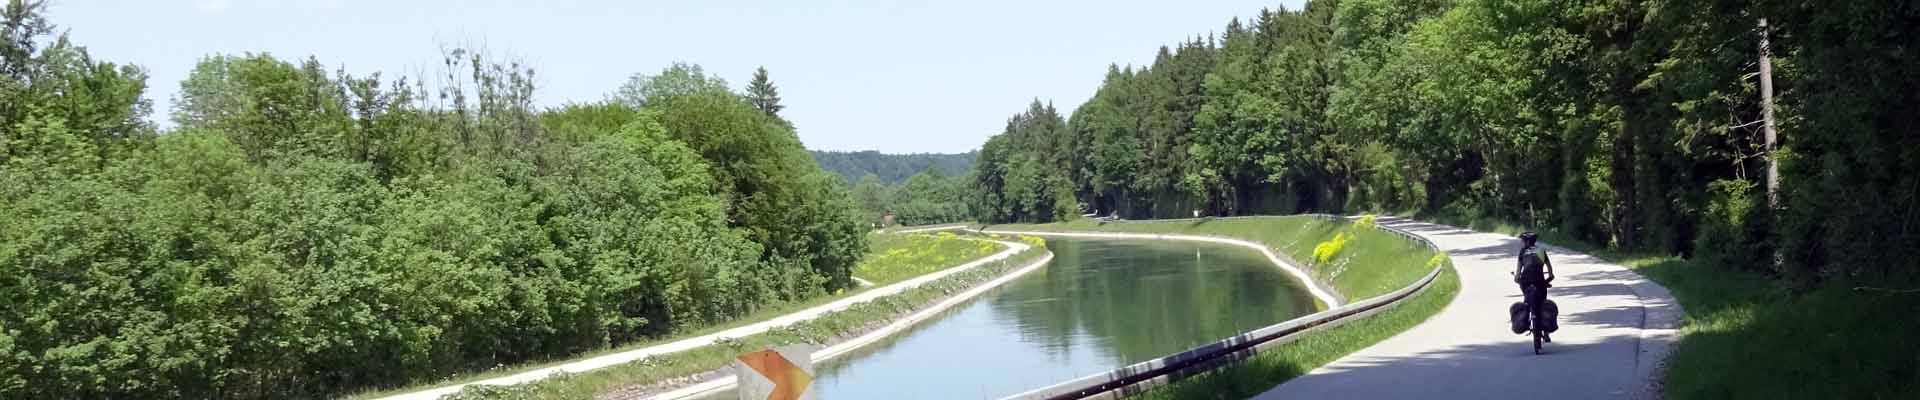 Isar-Donau-Tour - Bad Tölz-München